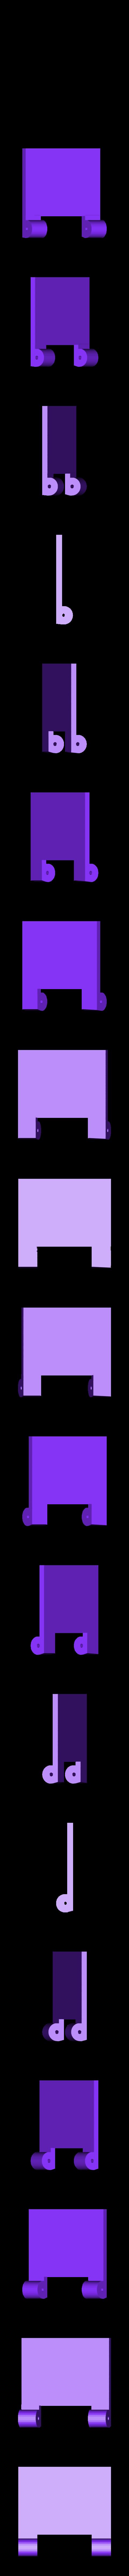 LittleboxLid.stl Download free STL file Box with hinge • 3D printable design, Minweth